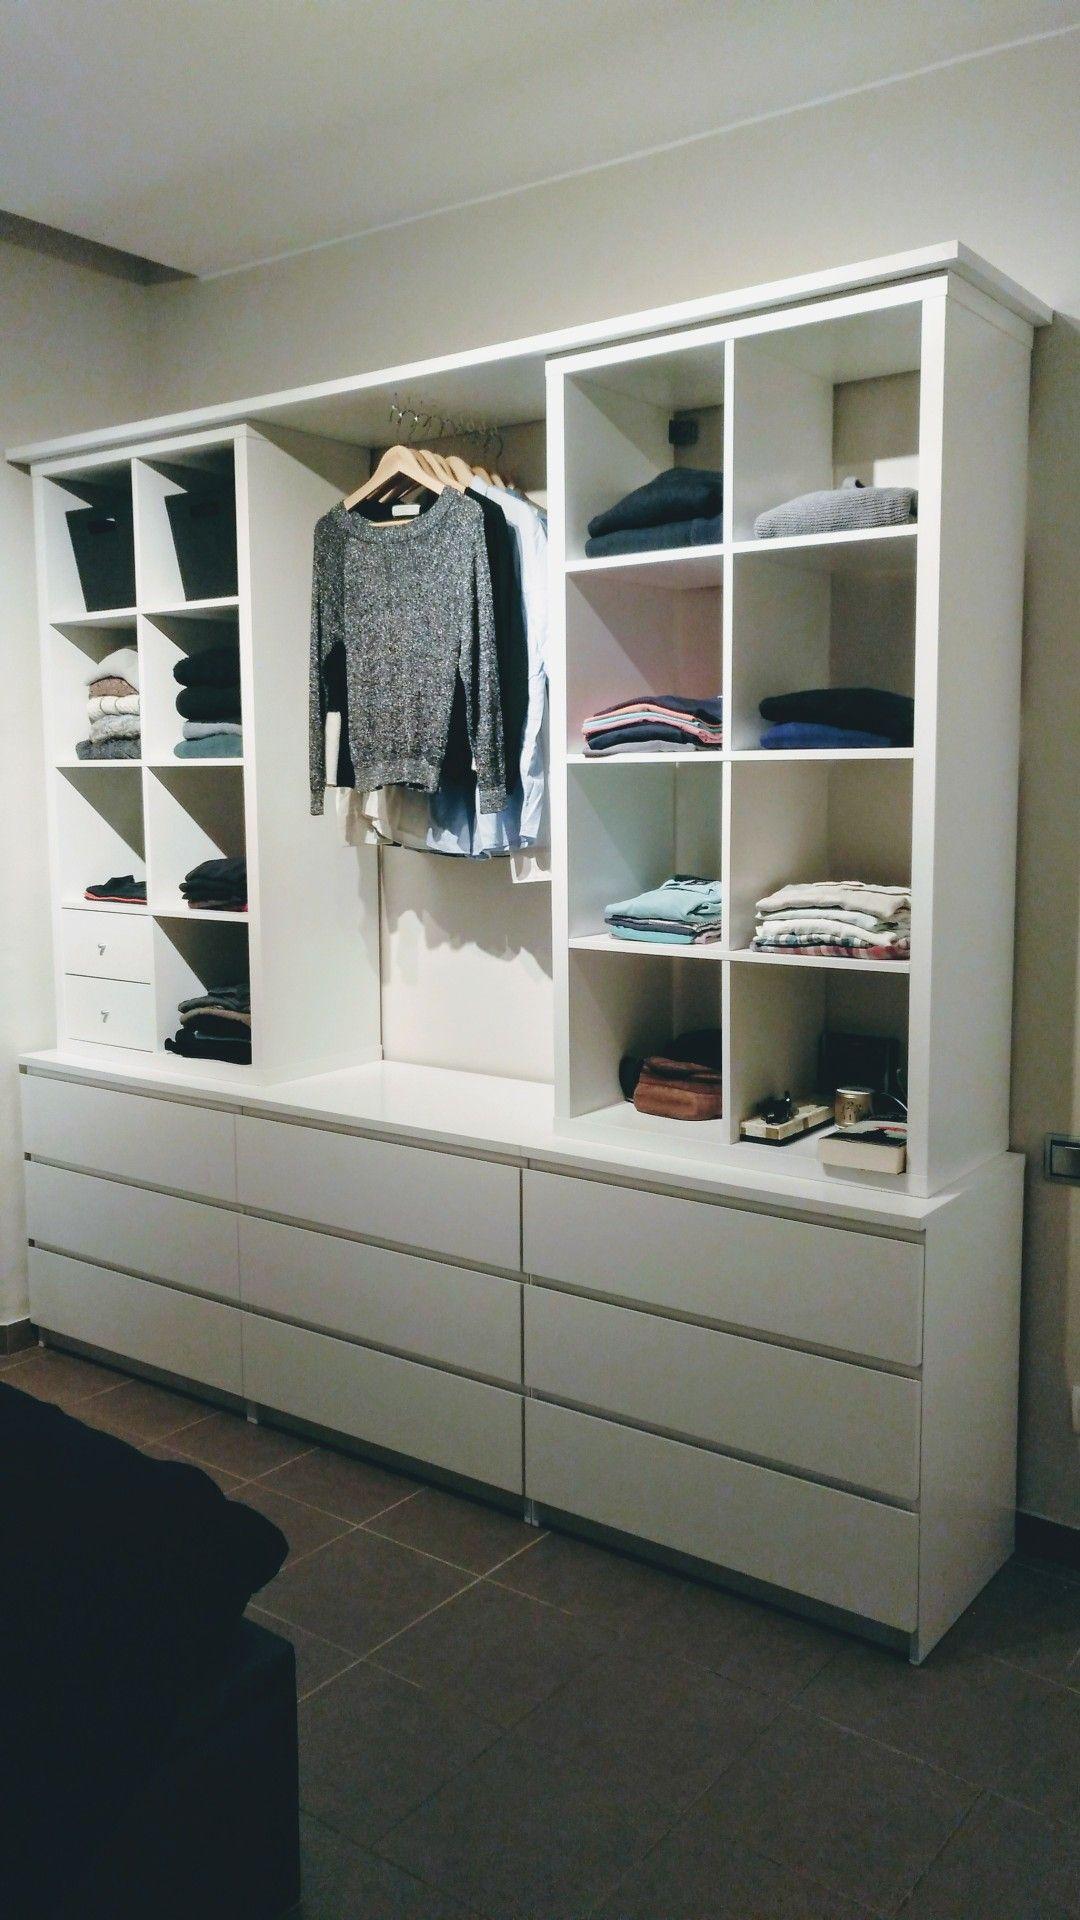 Armario abierto con kallax y malm recycling m bel in 2019 - Kallax ideen wohnzimmer ...